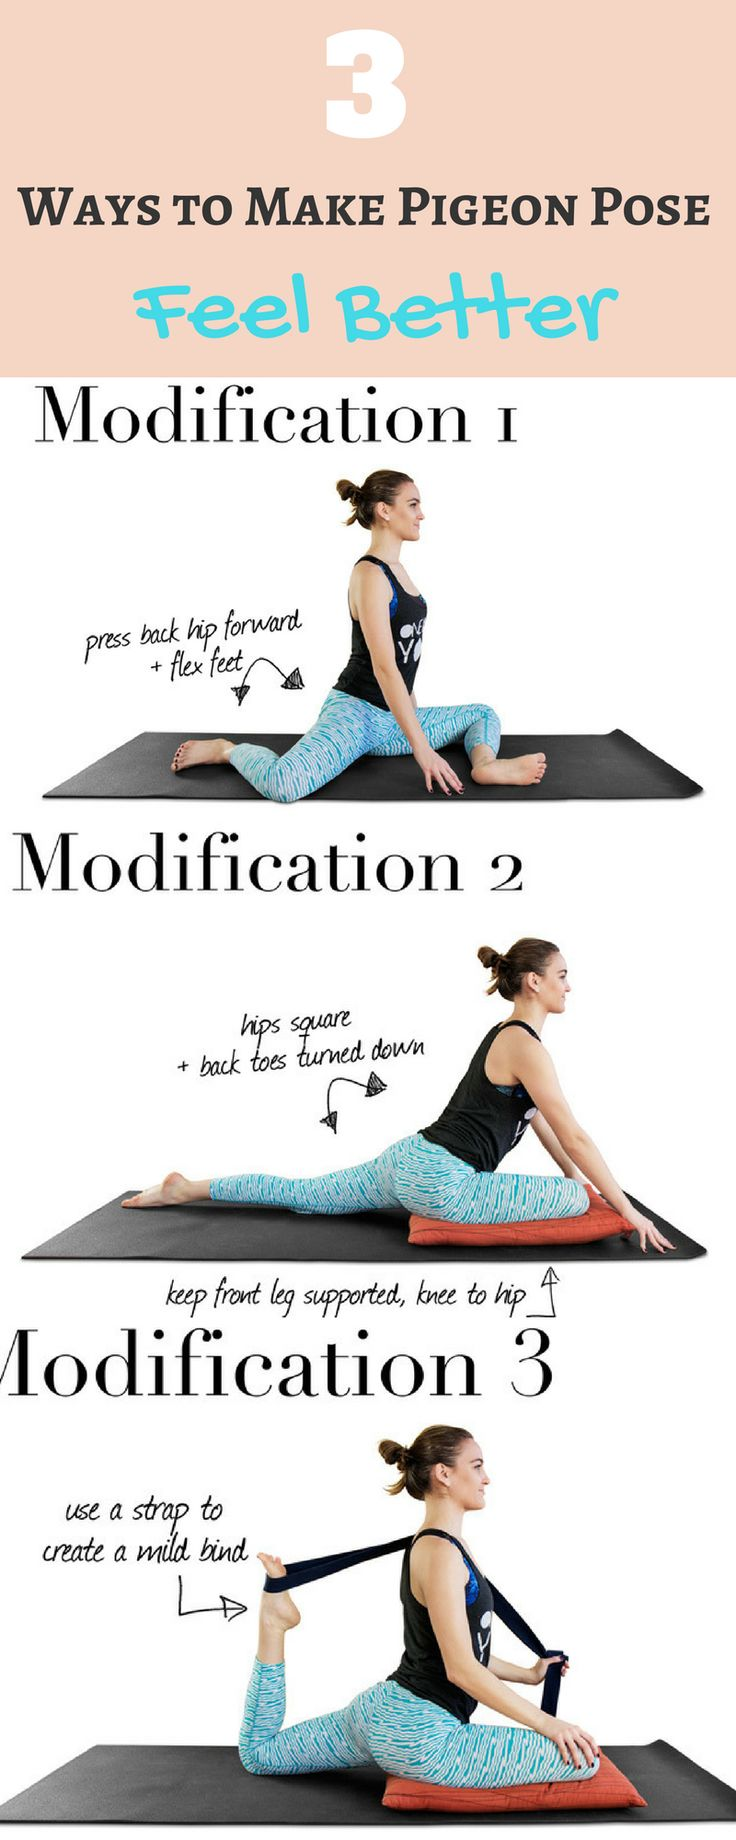 3 Ways To Make Pigeon Pose Feel Better | Pigeon pose ...